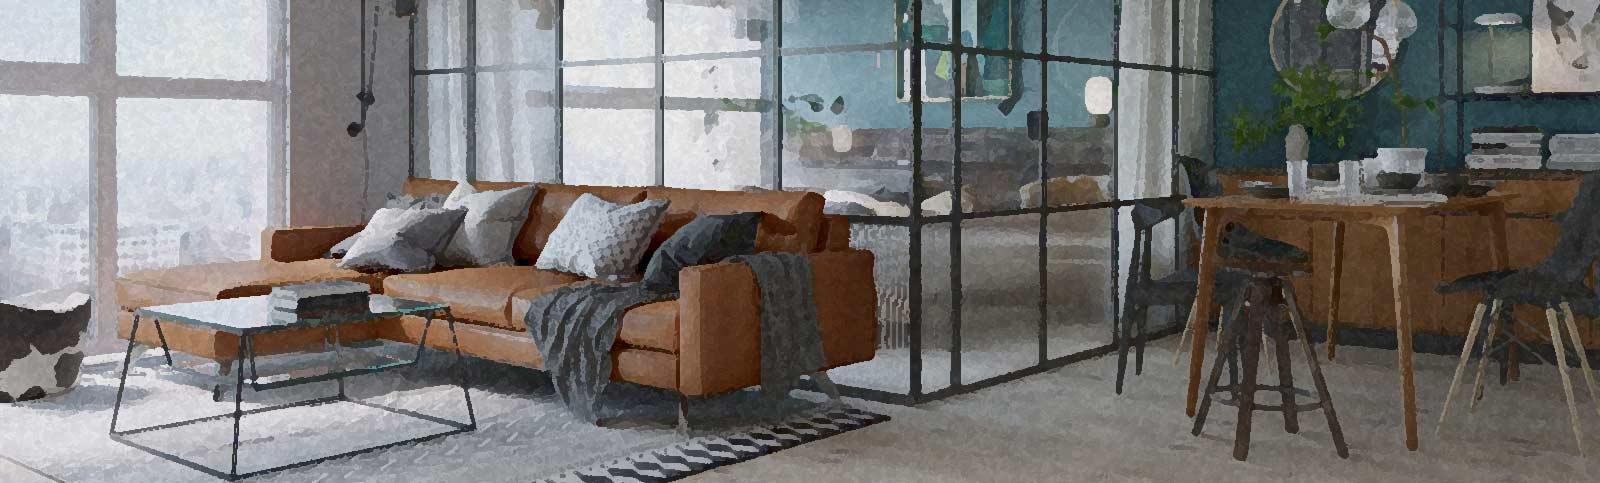 Beyond DIY: Choosing a Career as an Interior Designer